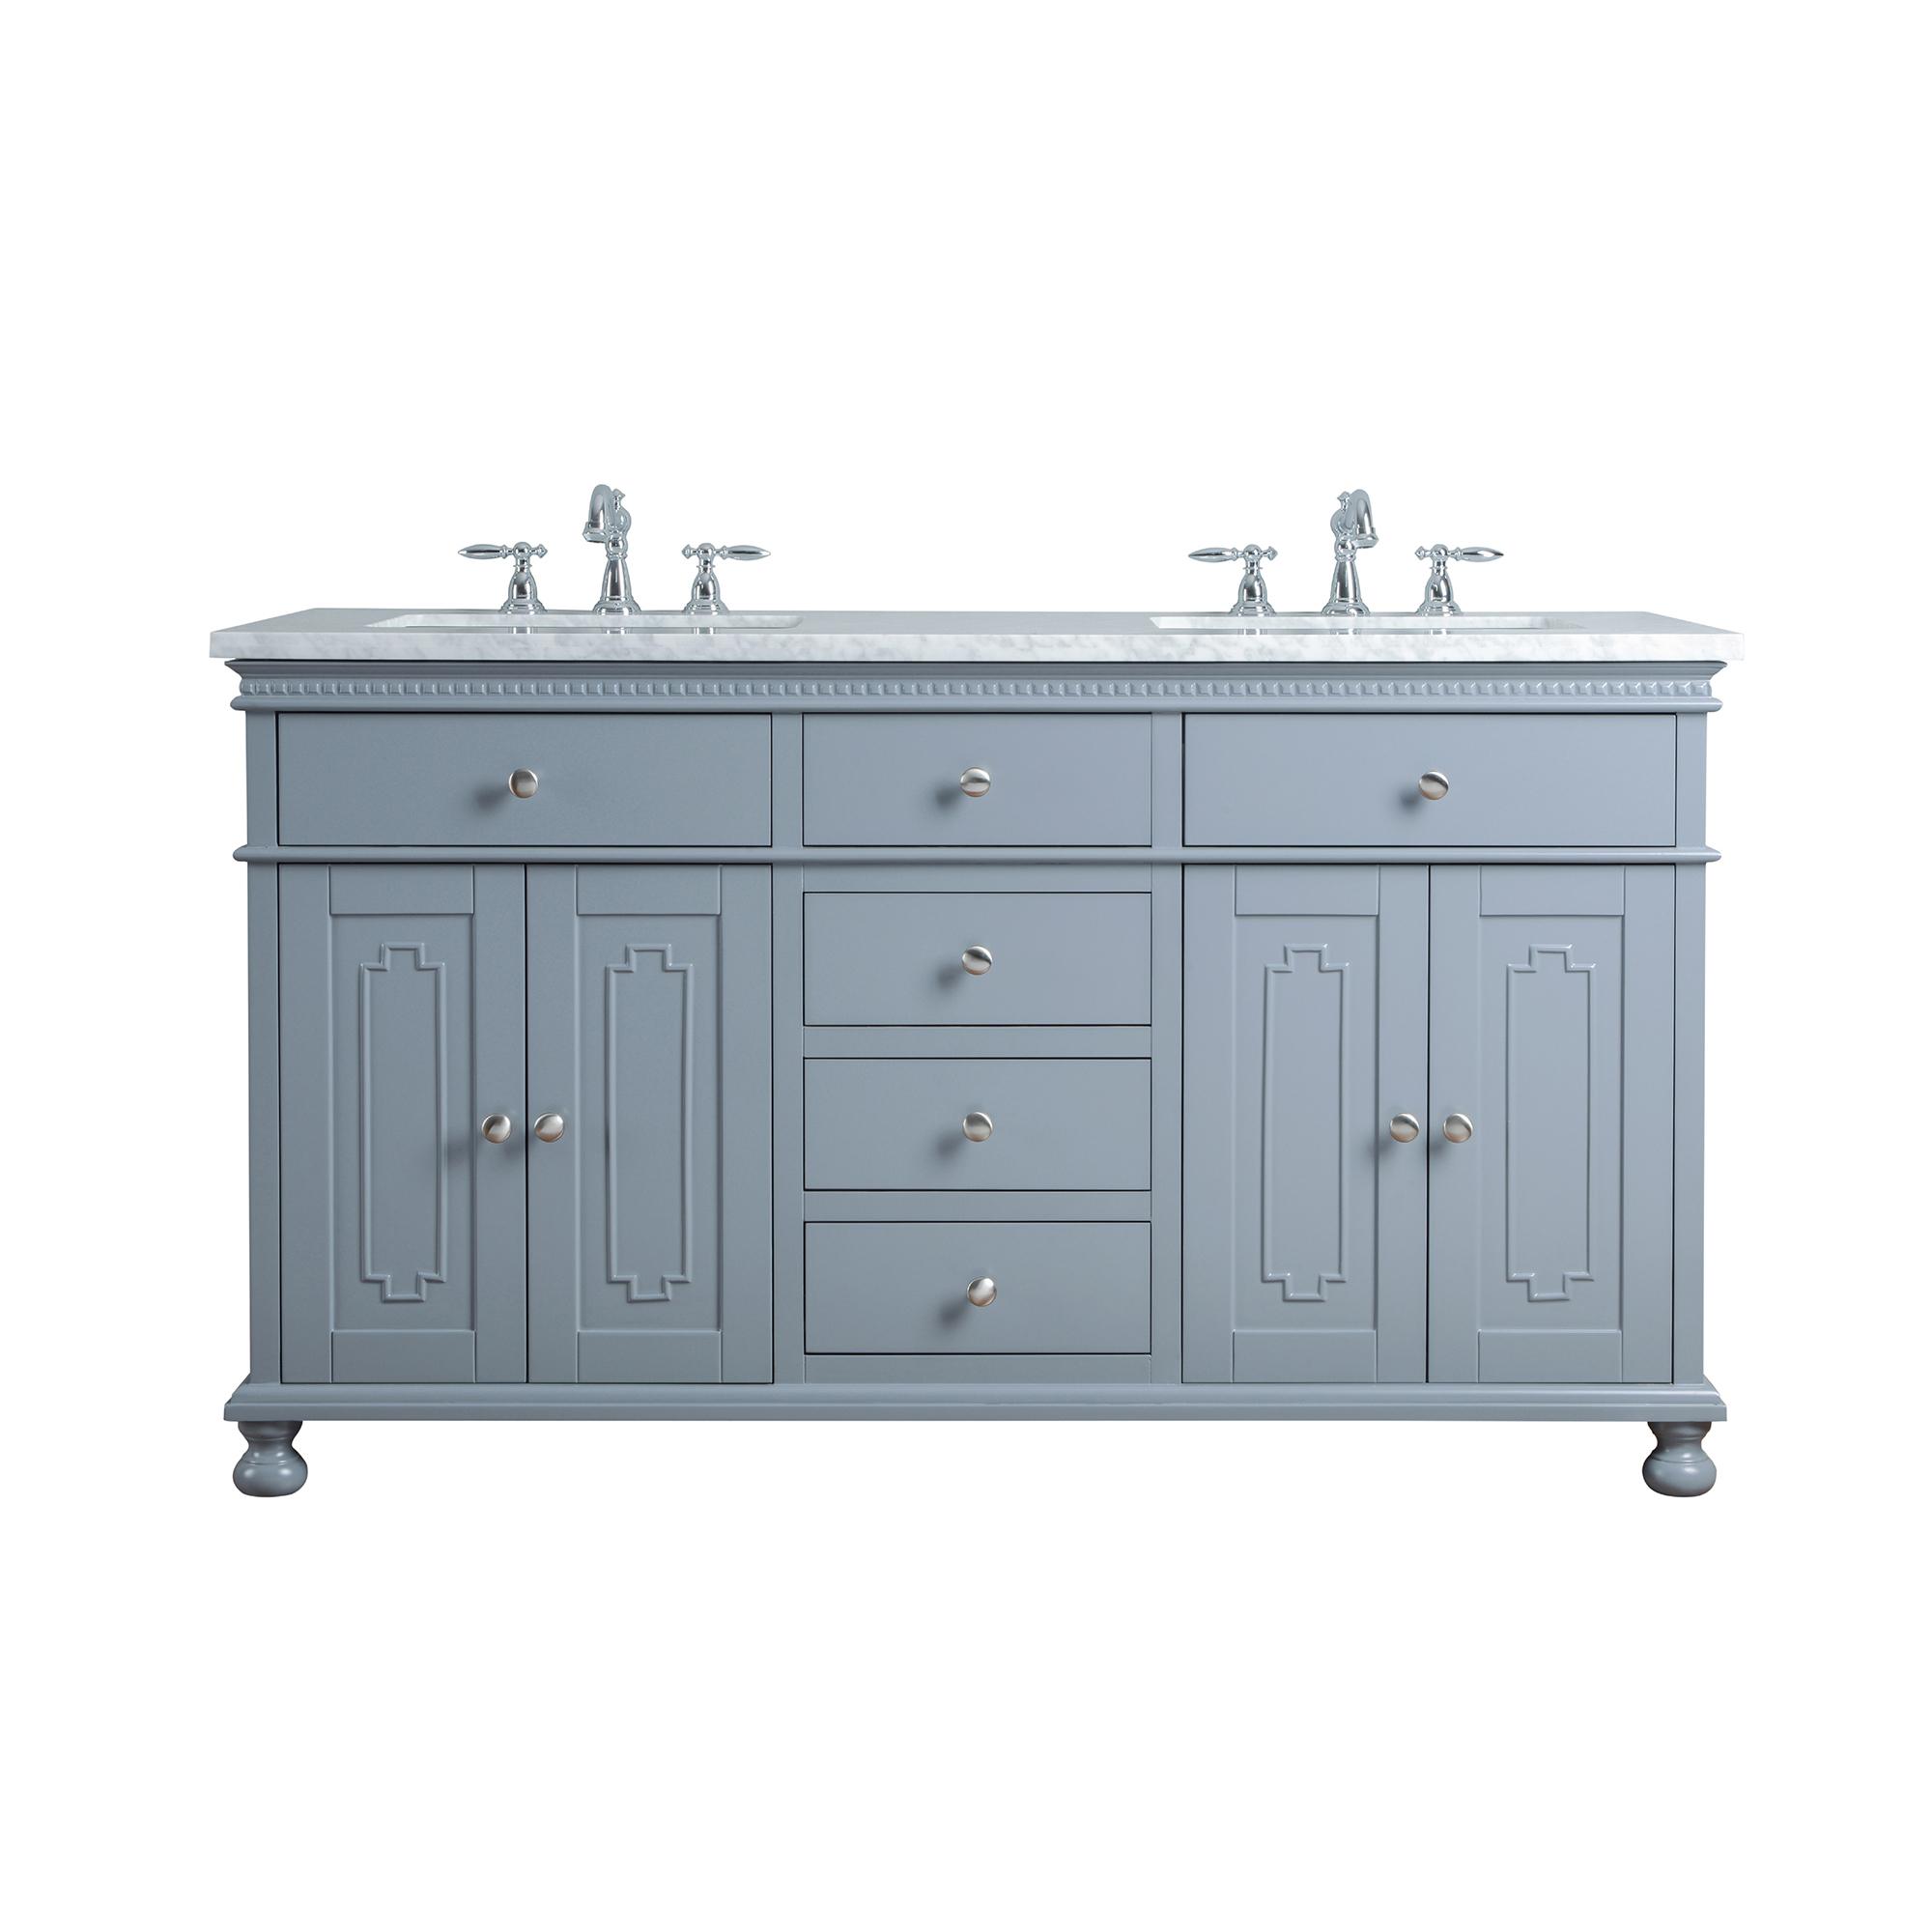 Abigail Embellished 60-inch Double Sink Bathroom Vanity - Grey